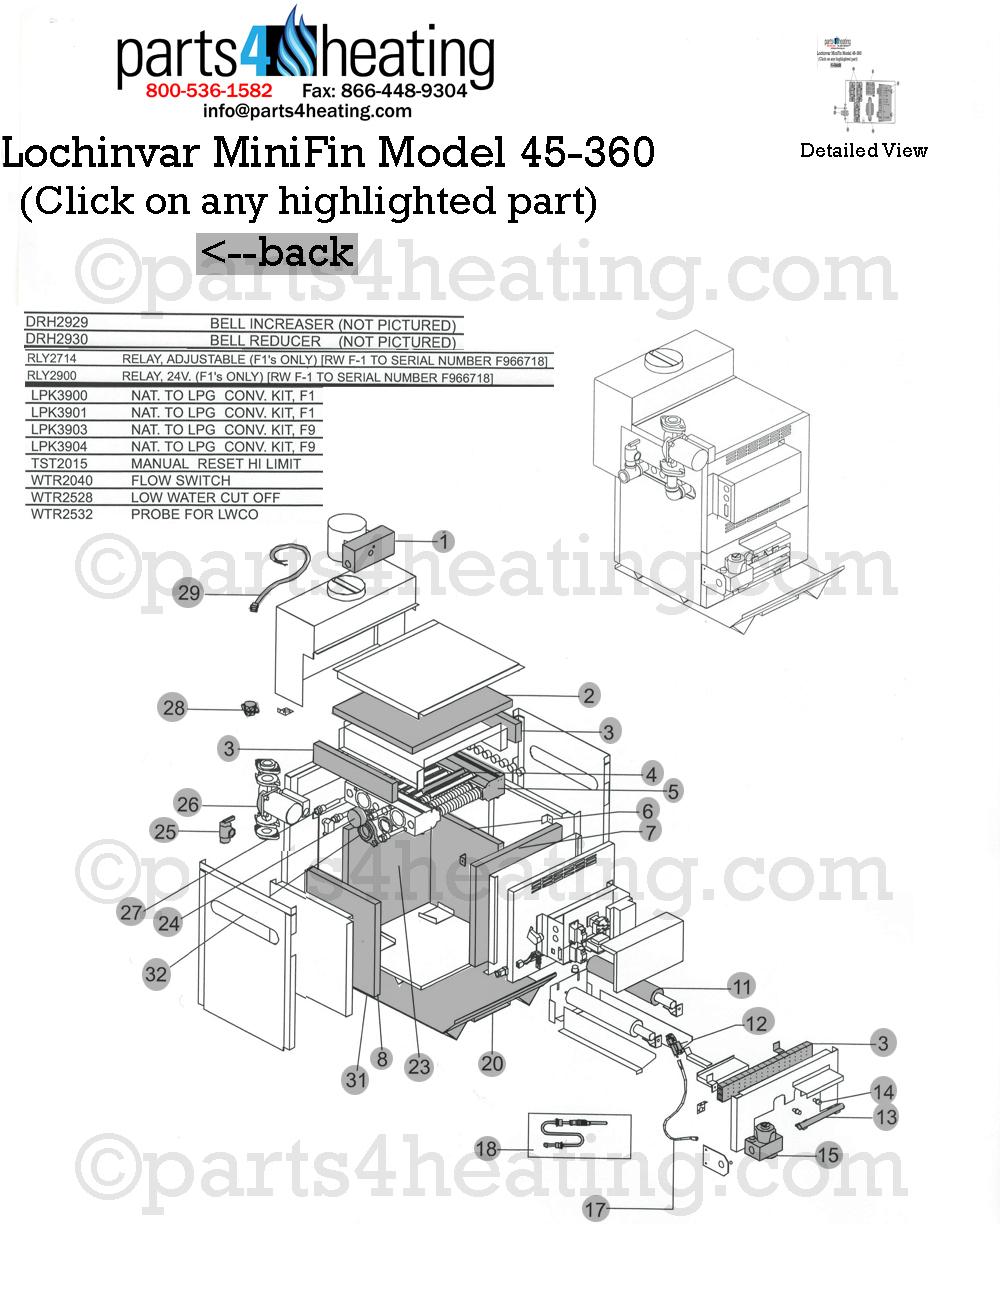 Lochinvar Knight Xl Service Manual